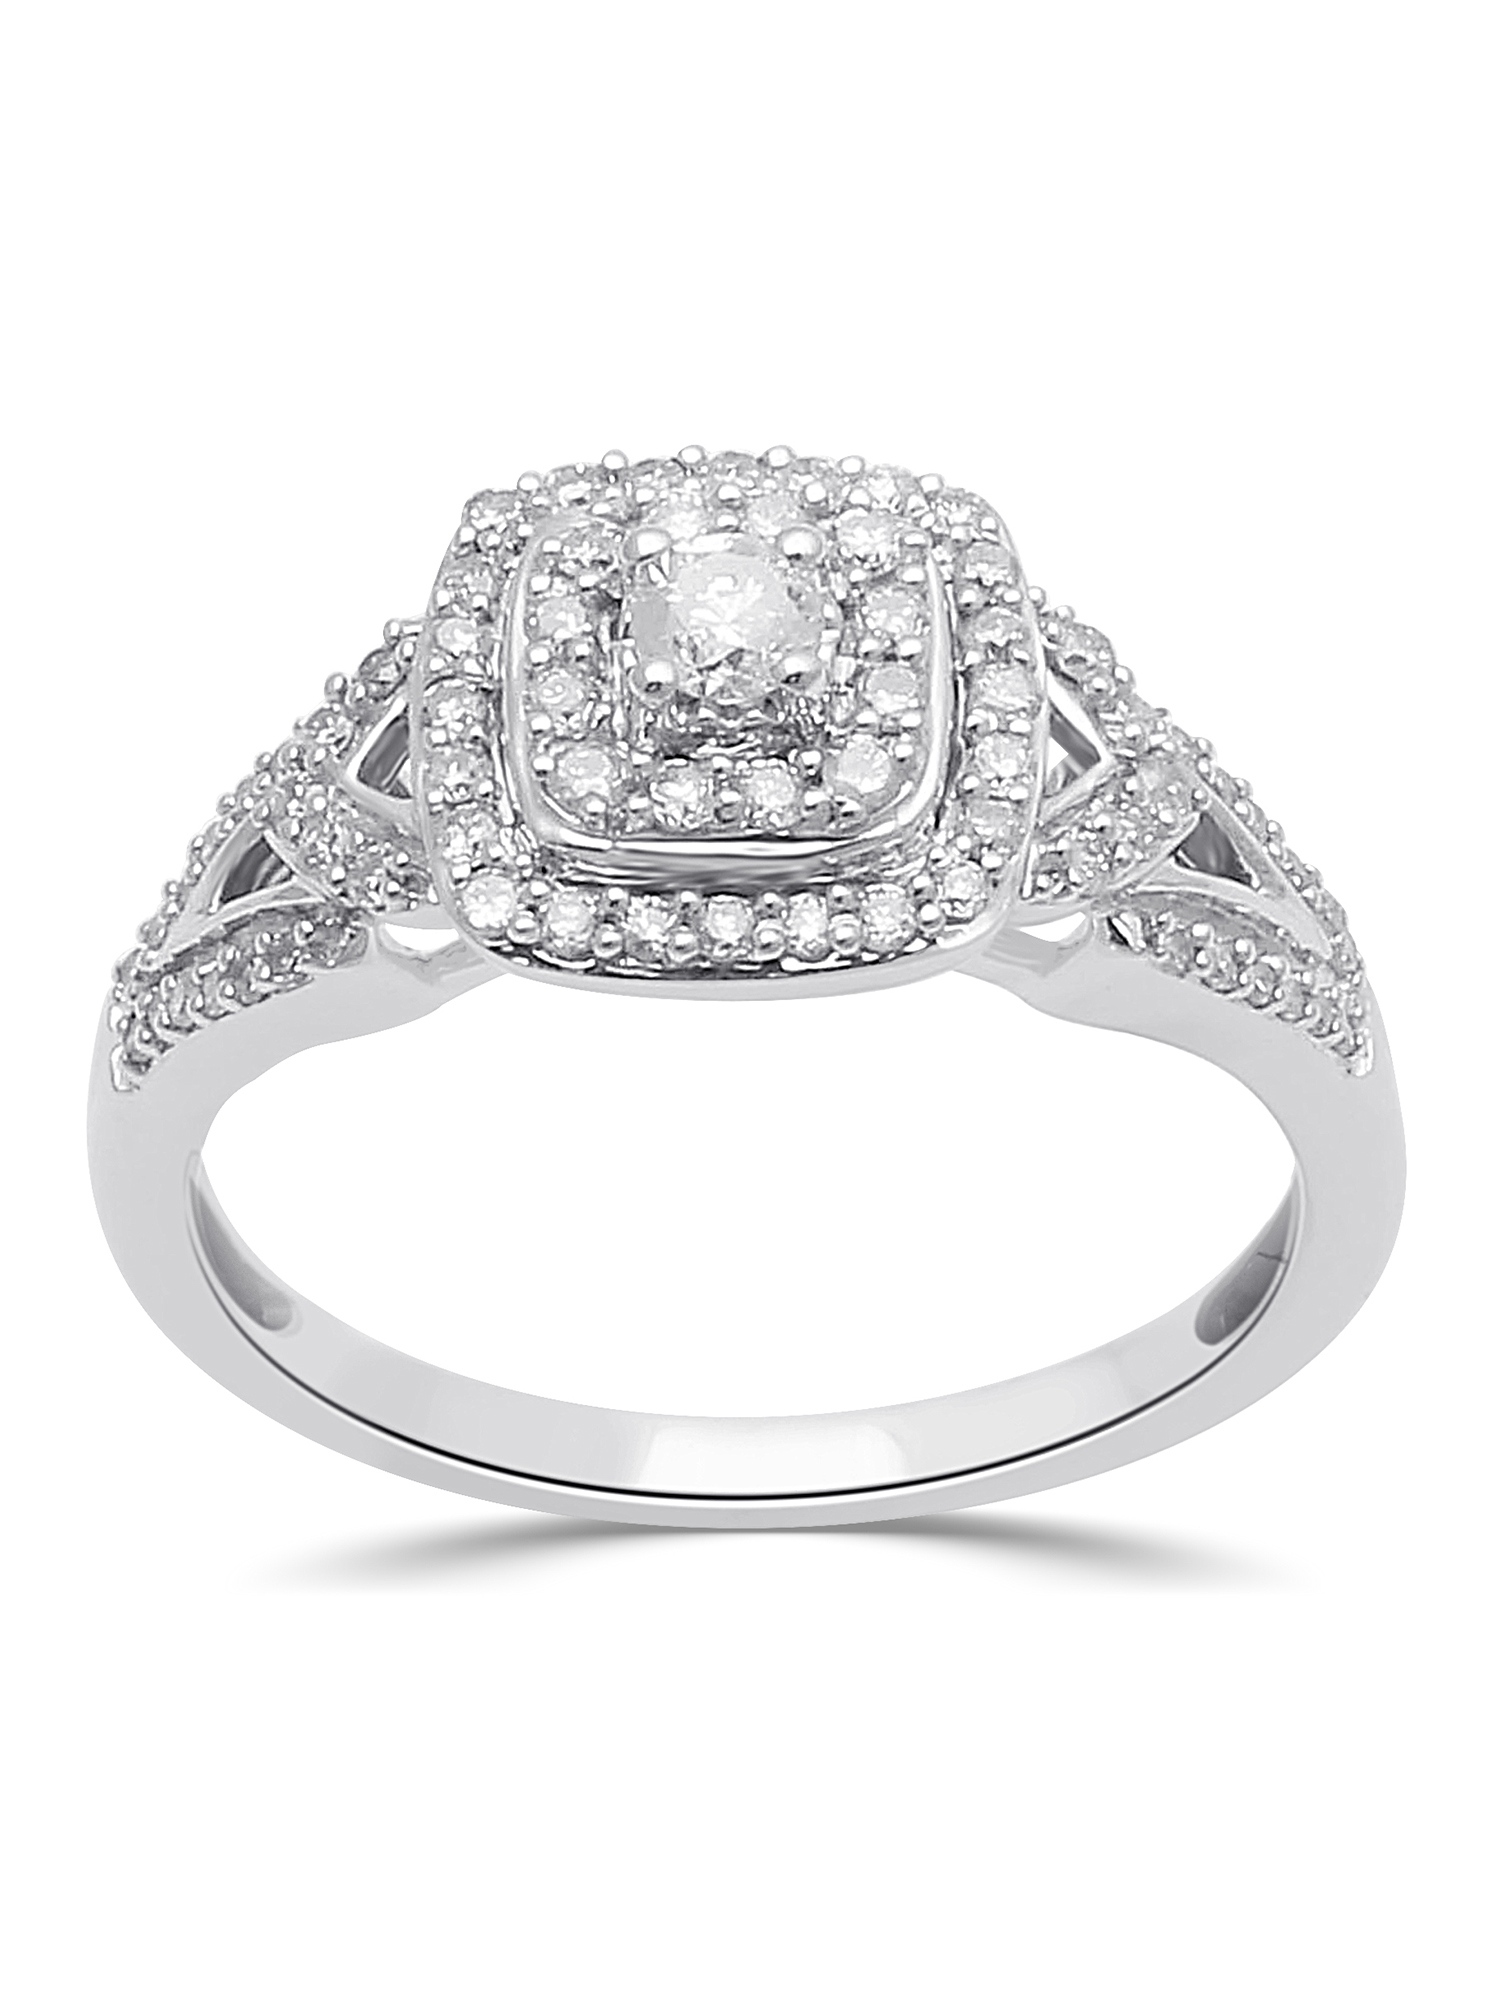 1/2 Carat T.W. Diamond Sterling Silver Anniversary Ring